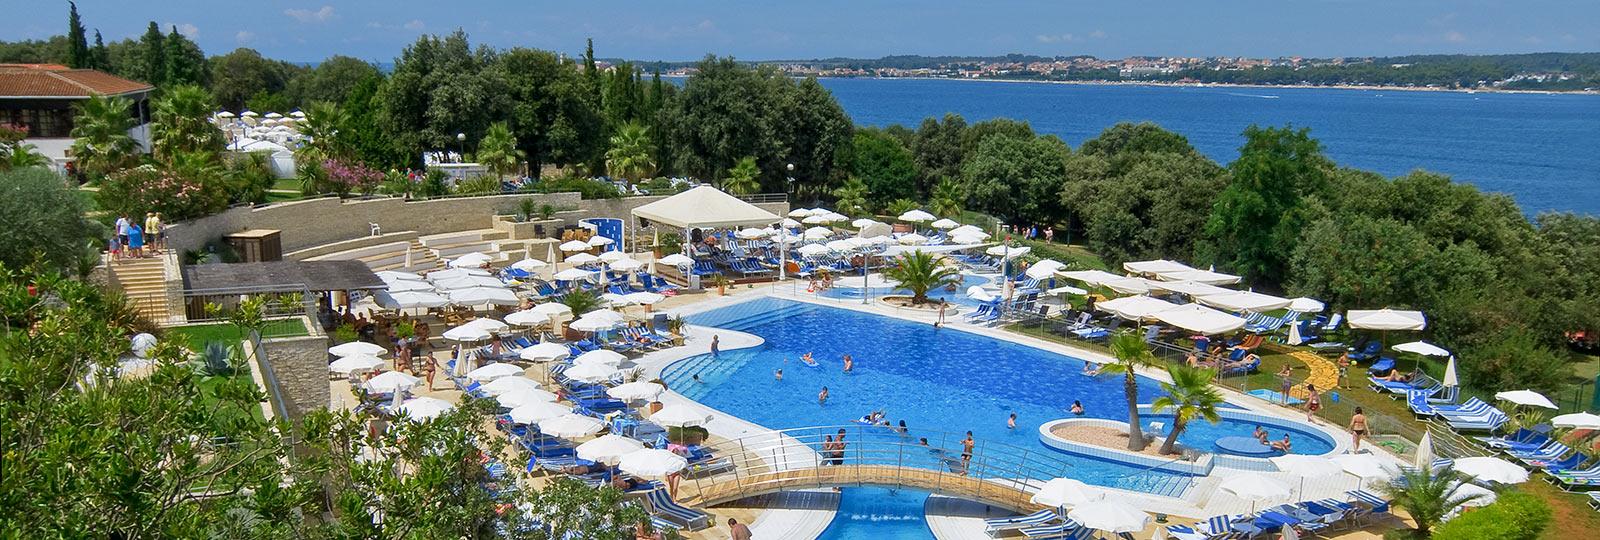 Valamar Tamaris Casa Agava  Tamaris Resort Pore Kroatien